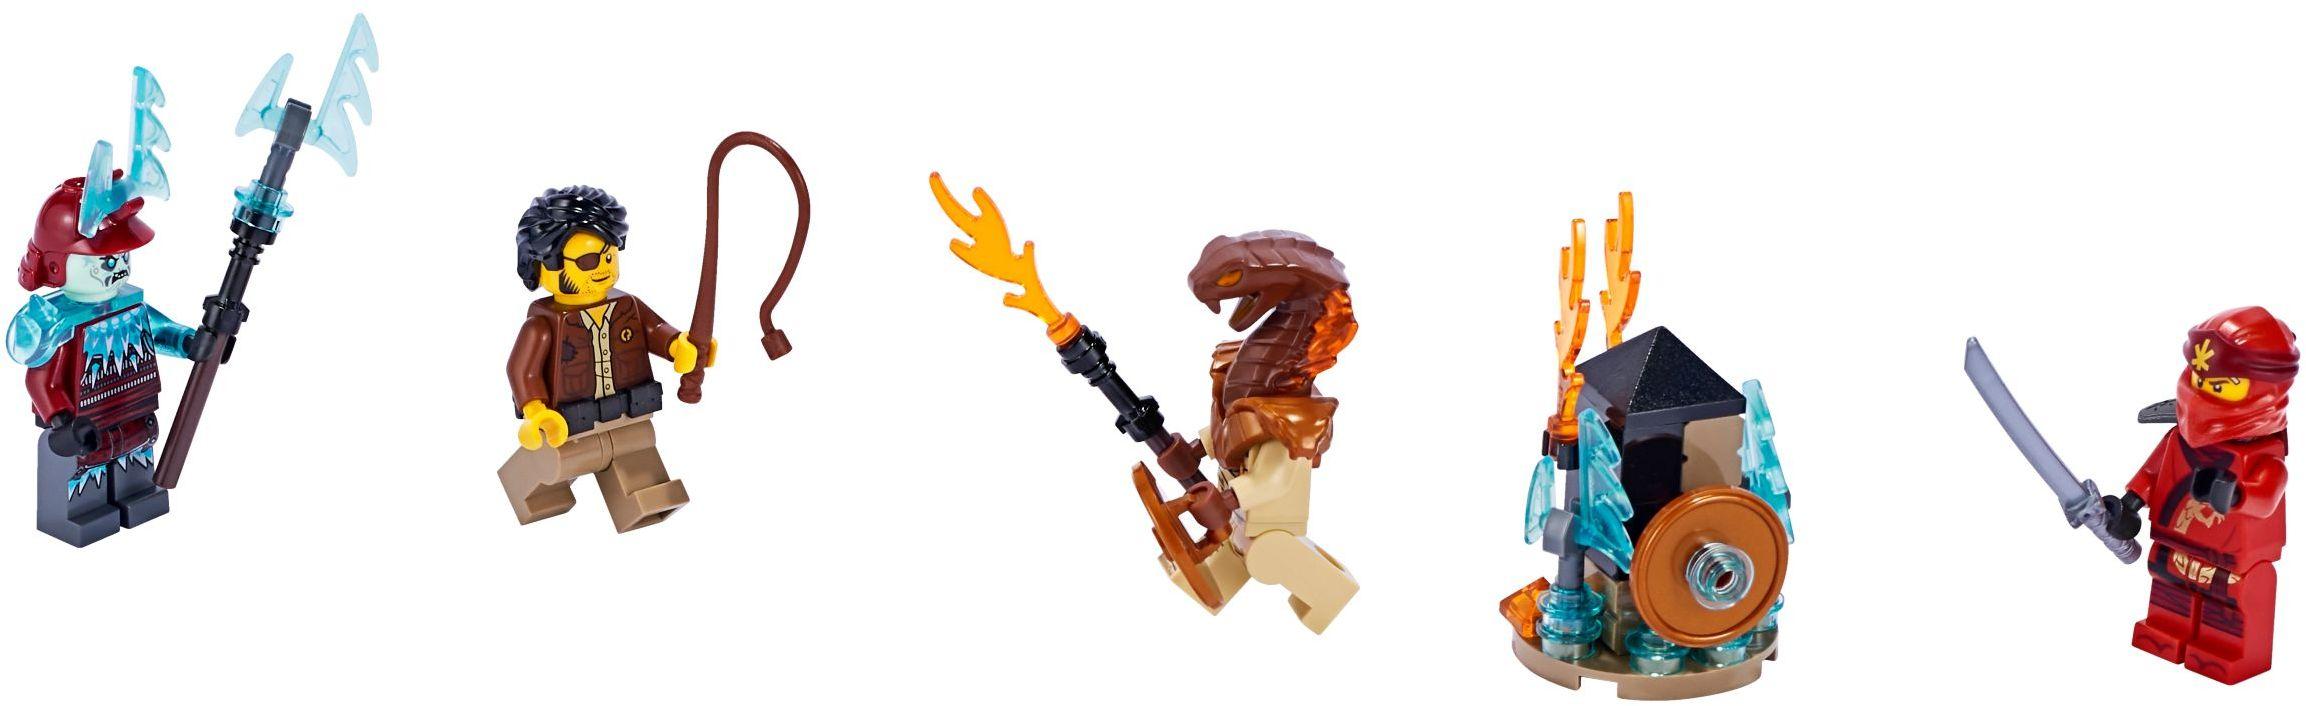 LEGO Ninjago Blizzard Archer Minifigure 70678 Secrets of Forbidden Spinjitzu